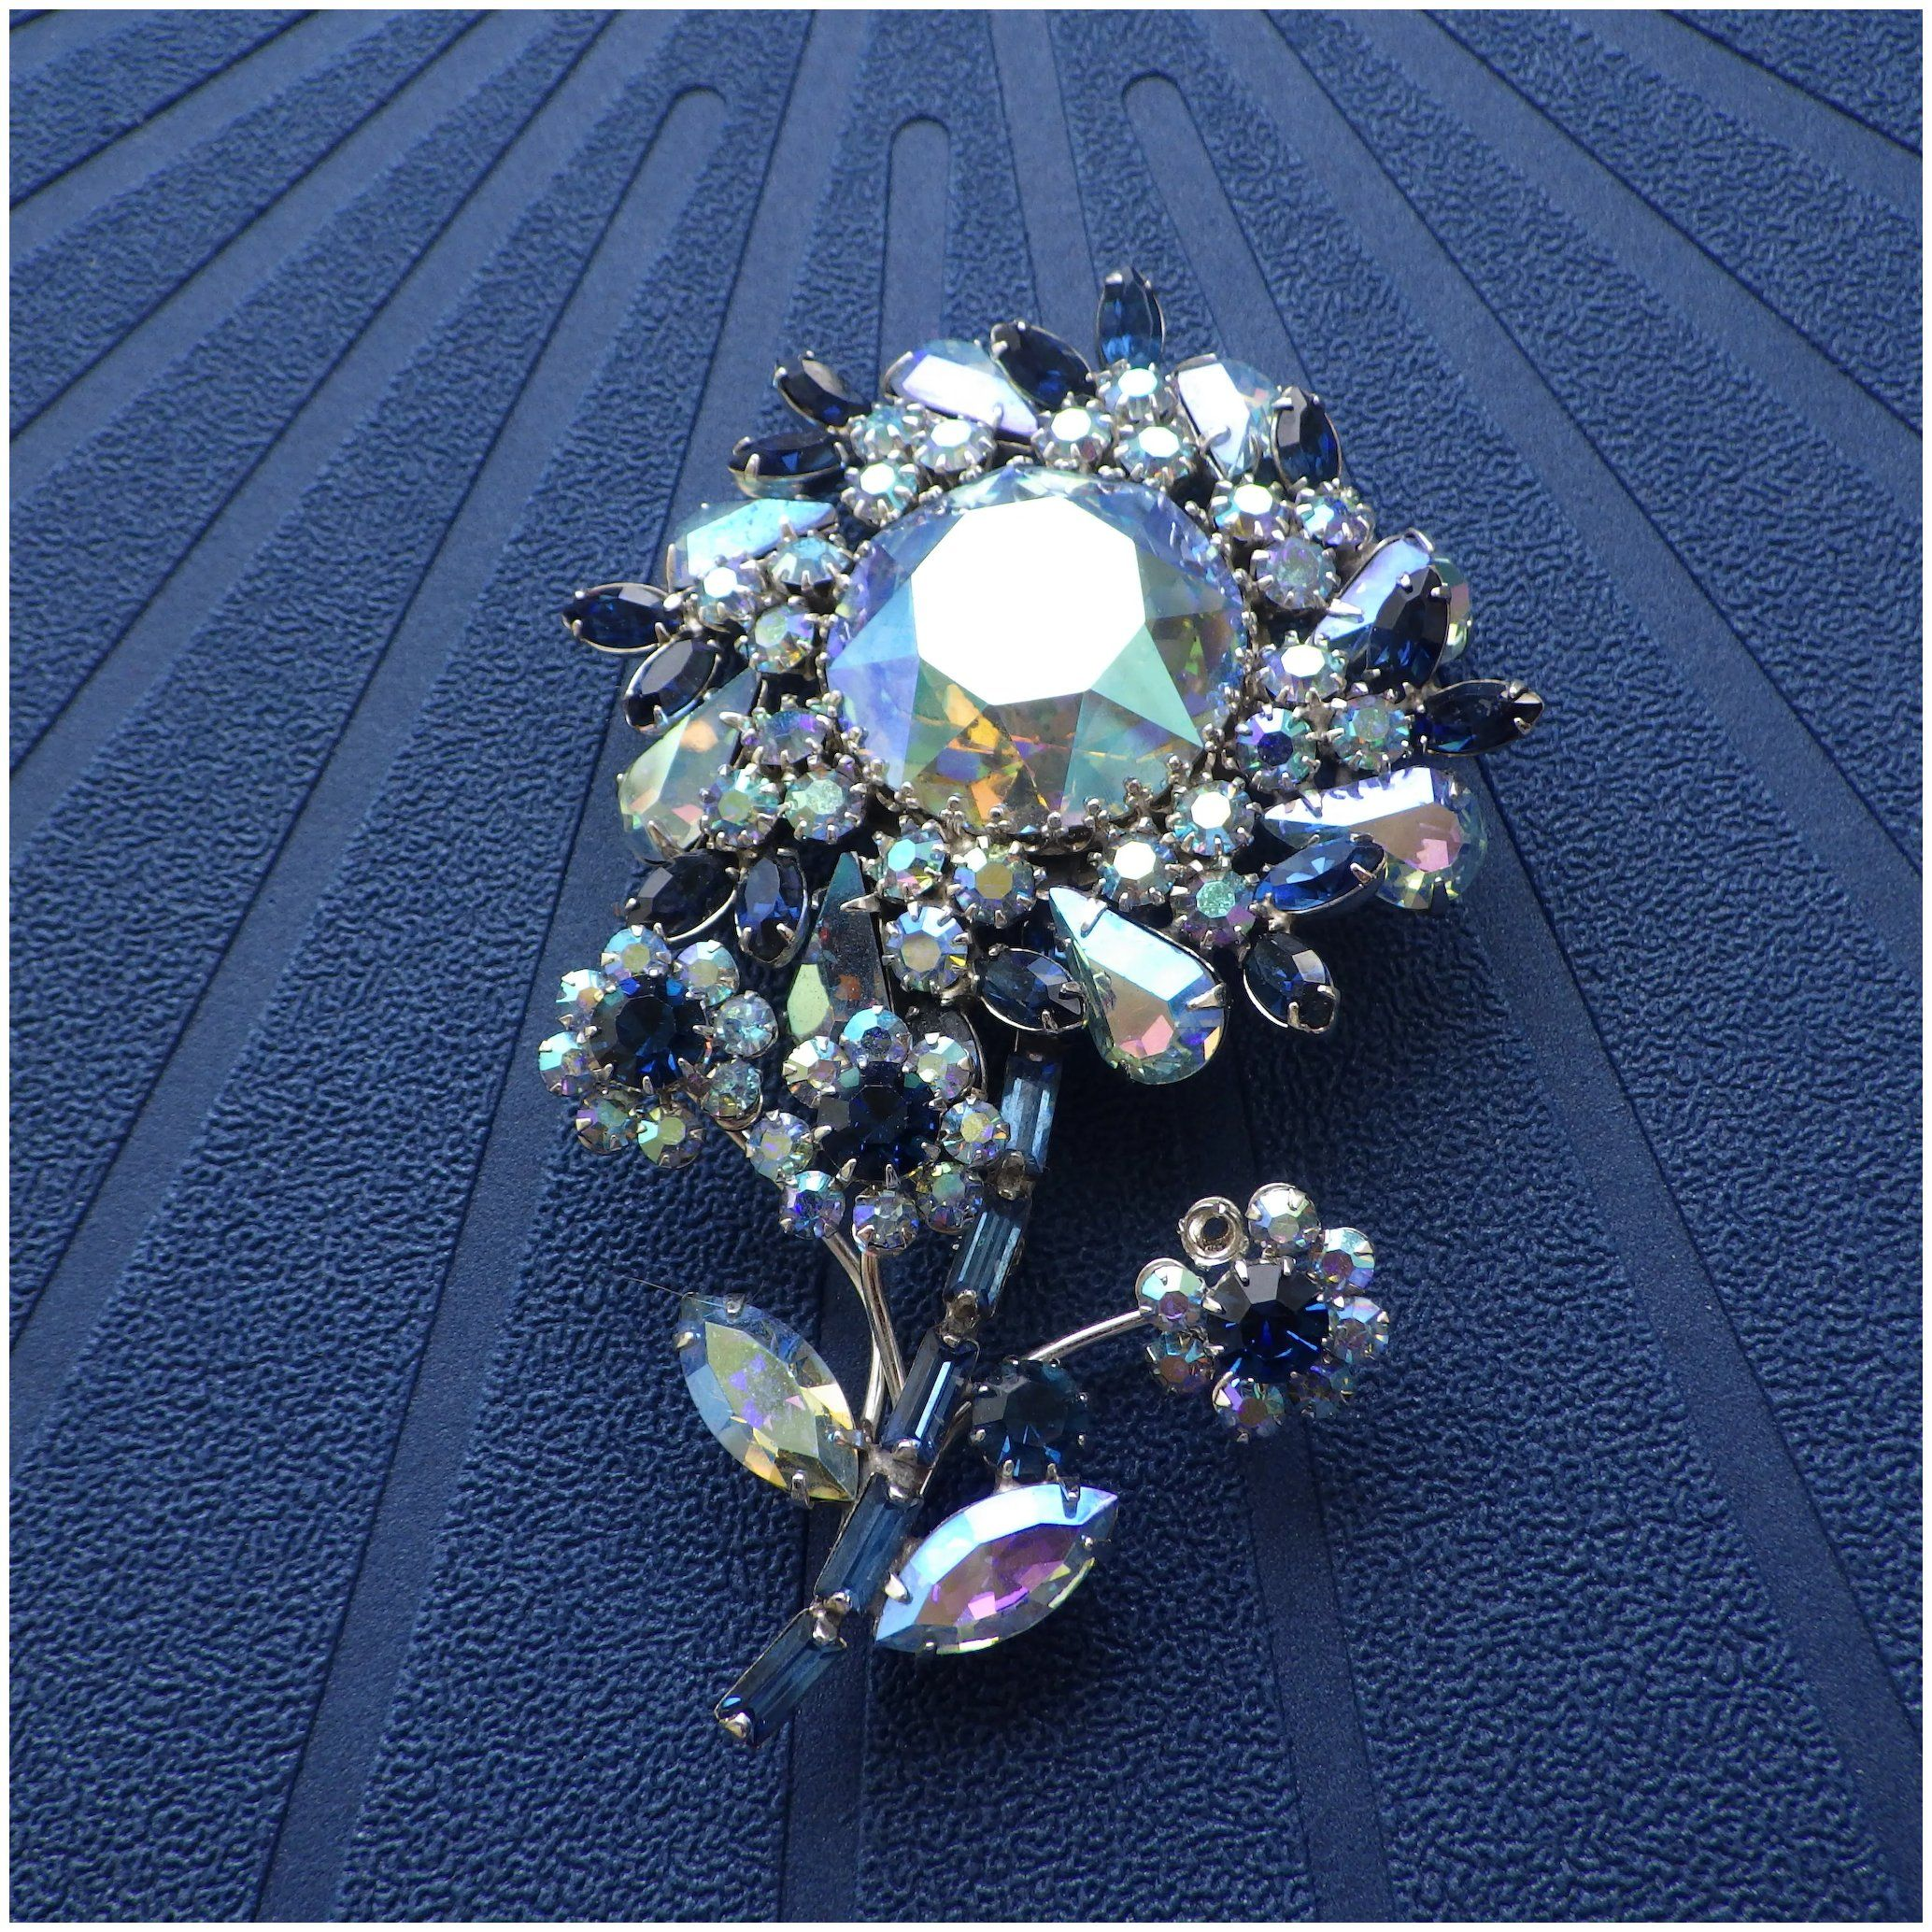 BroochClip-On Earrings Austria Shades of Blue Rhinestones Flower SET